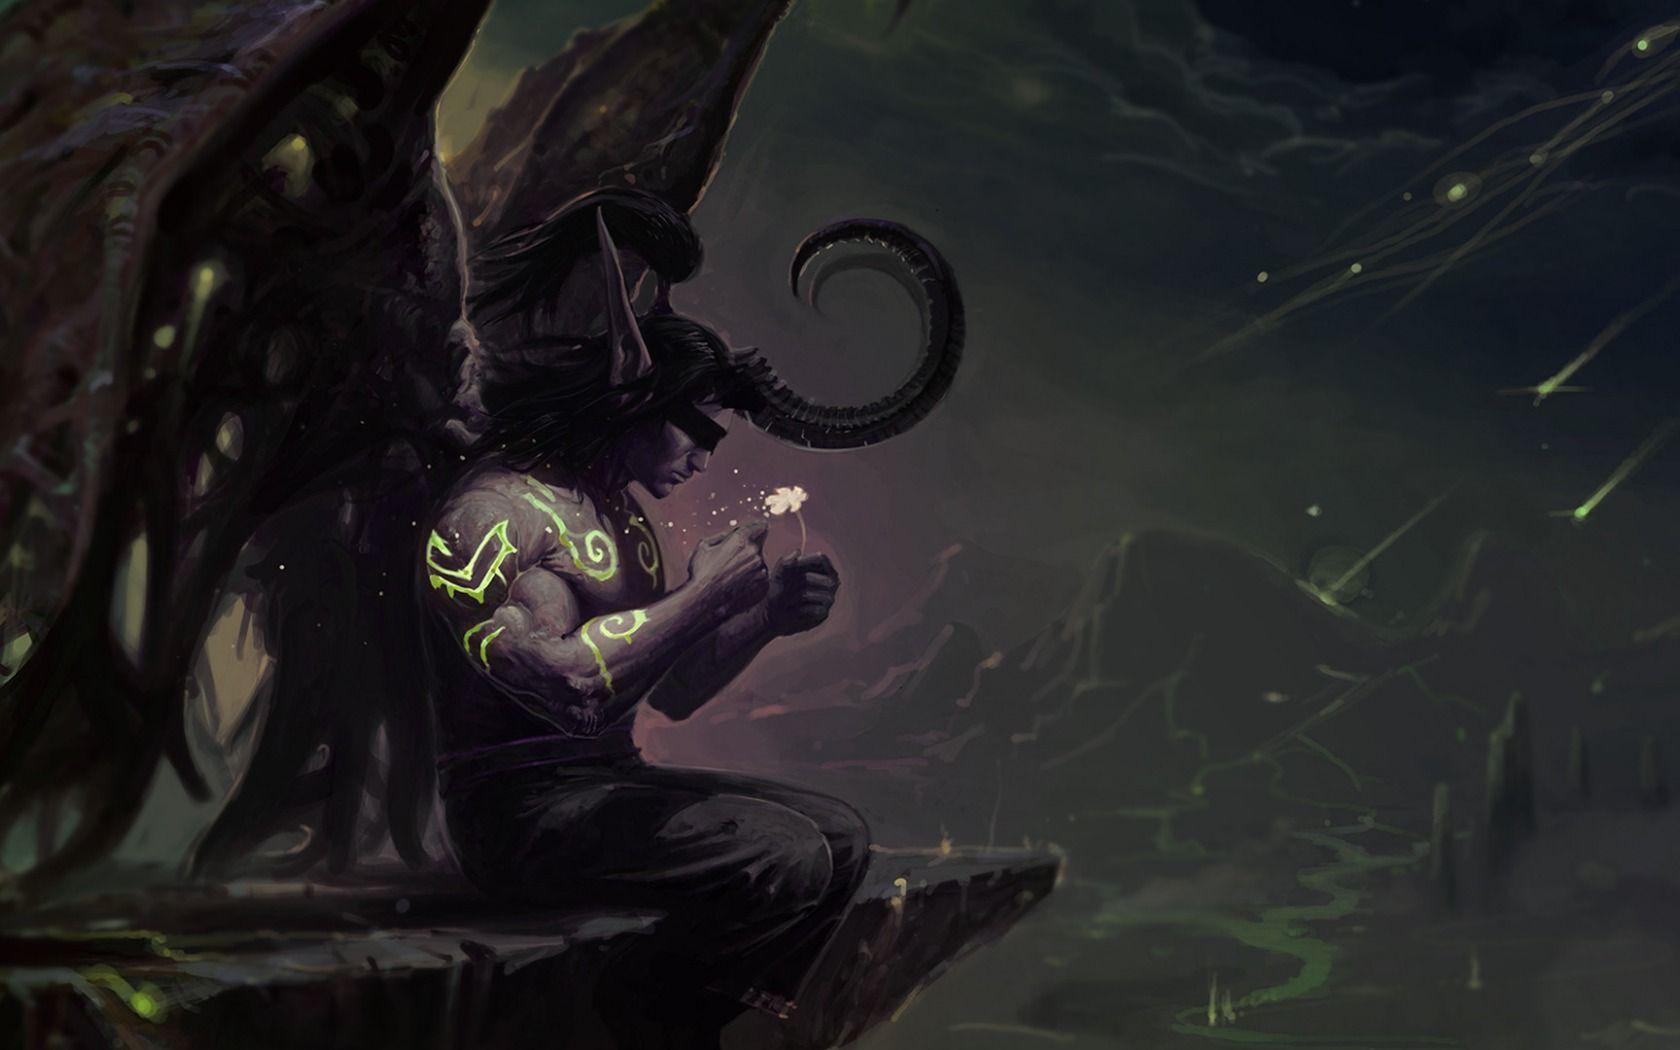 Download Wallpaper Wow World Of Warcraft Illidan Stormrage